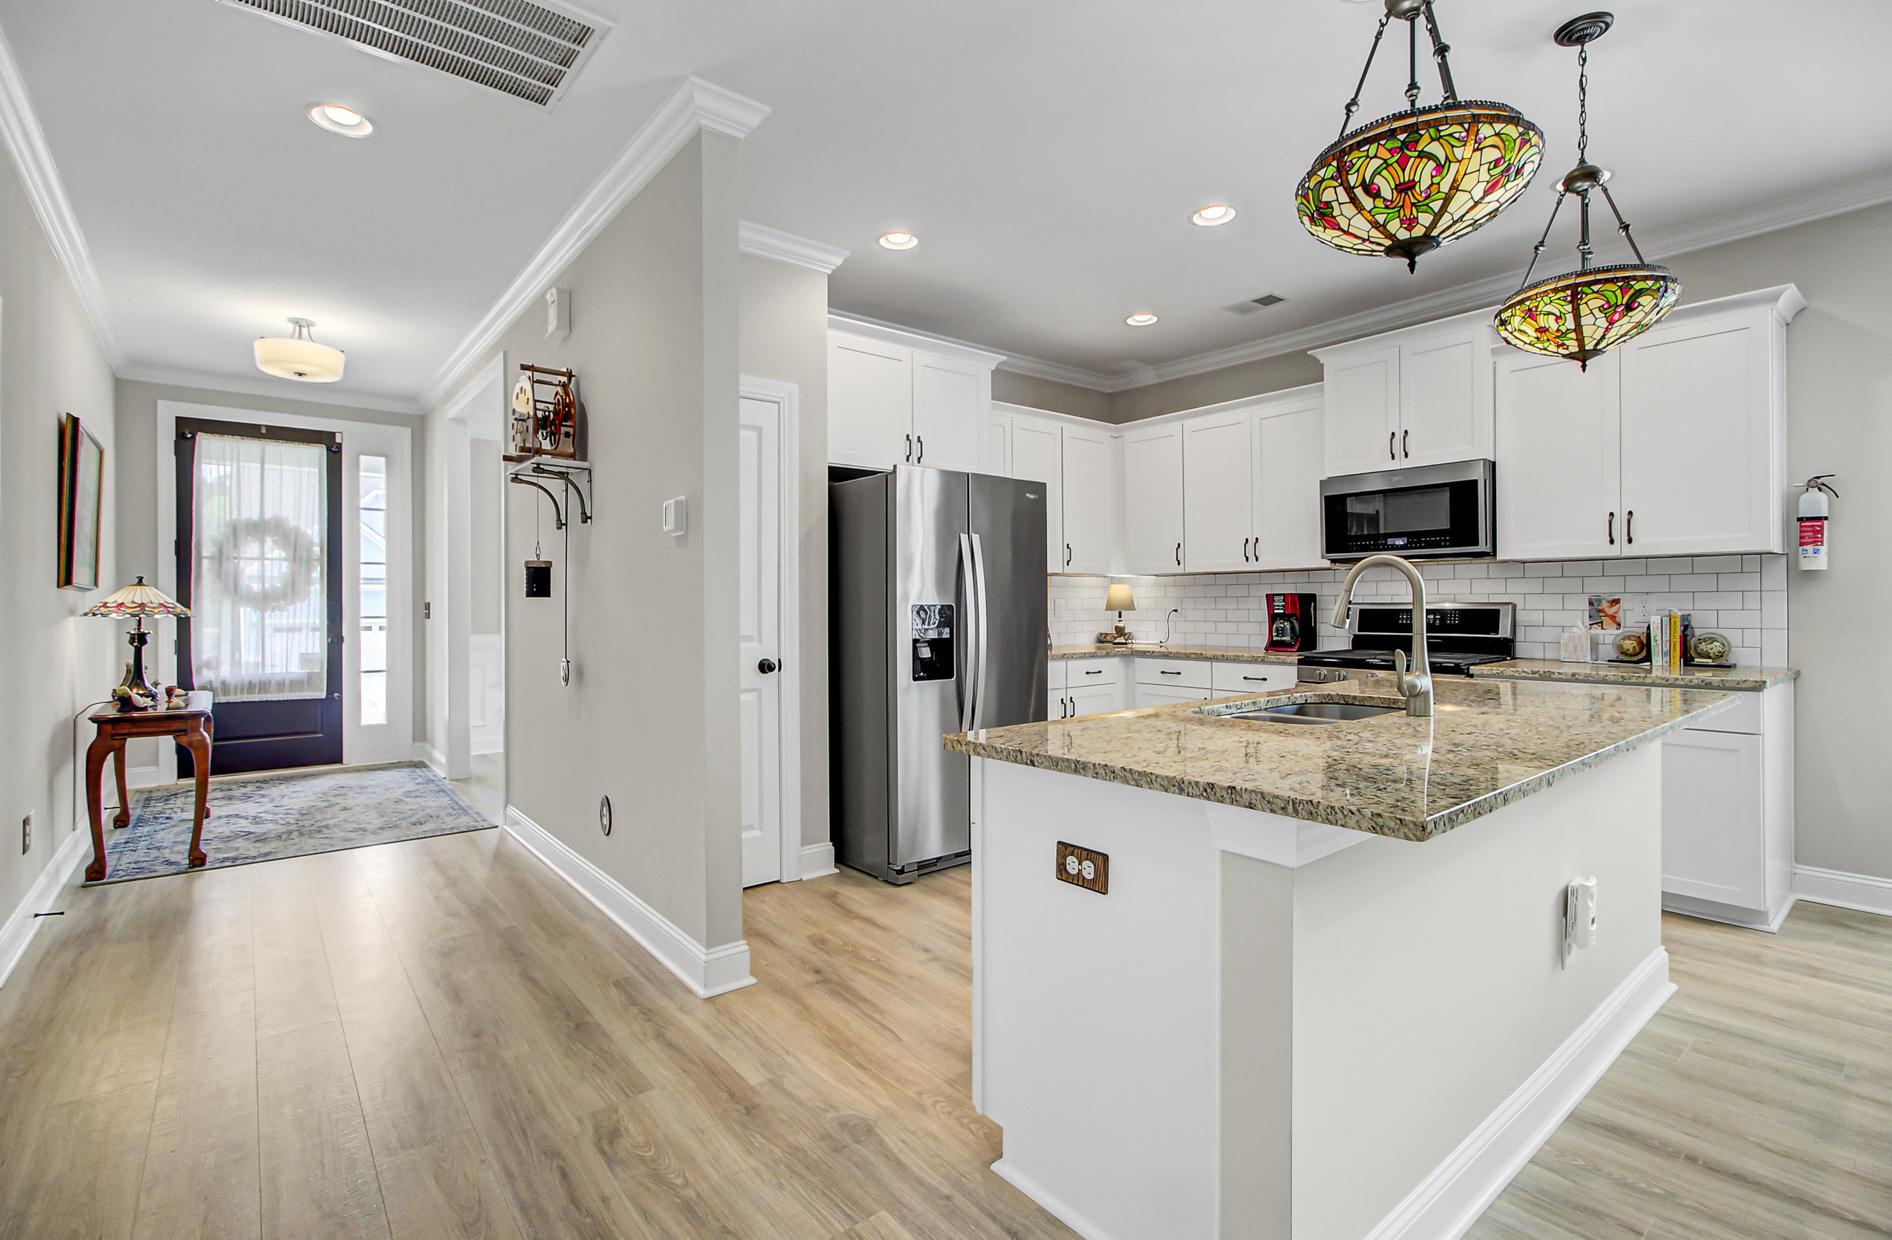 Park West Homes For Sale - 2824 Wagner, Mount Pleasant, SC - 5